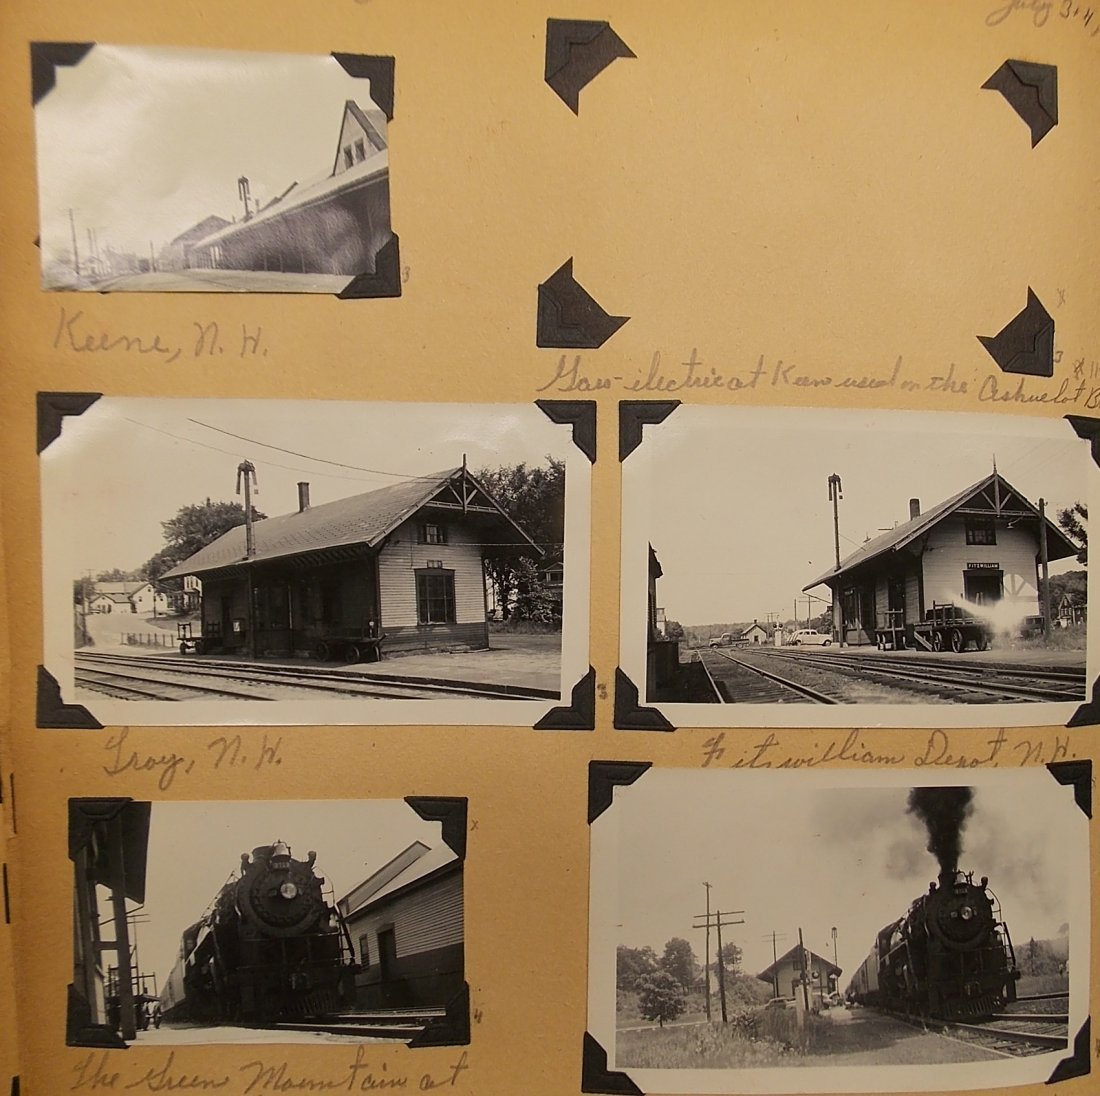 Old Boston & Maine Photo Scrapbook (450+) - 2